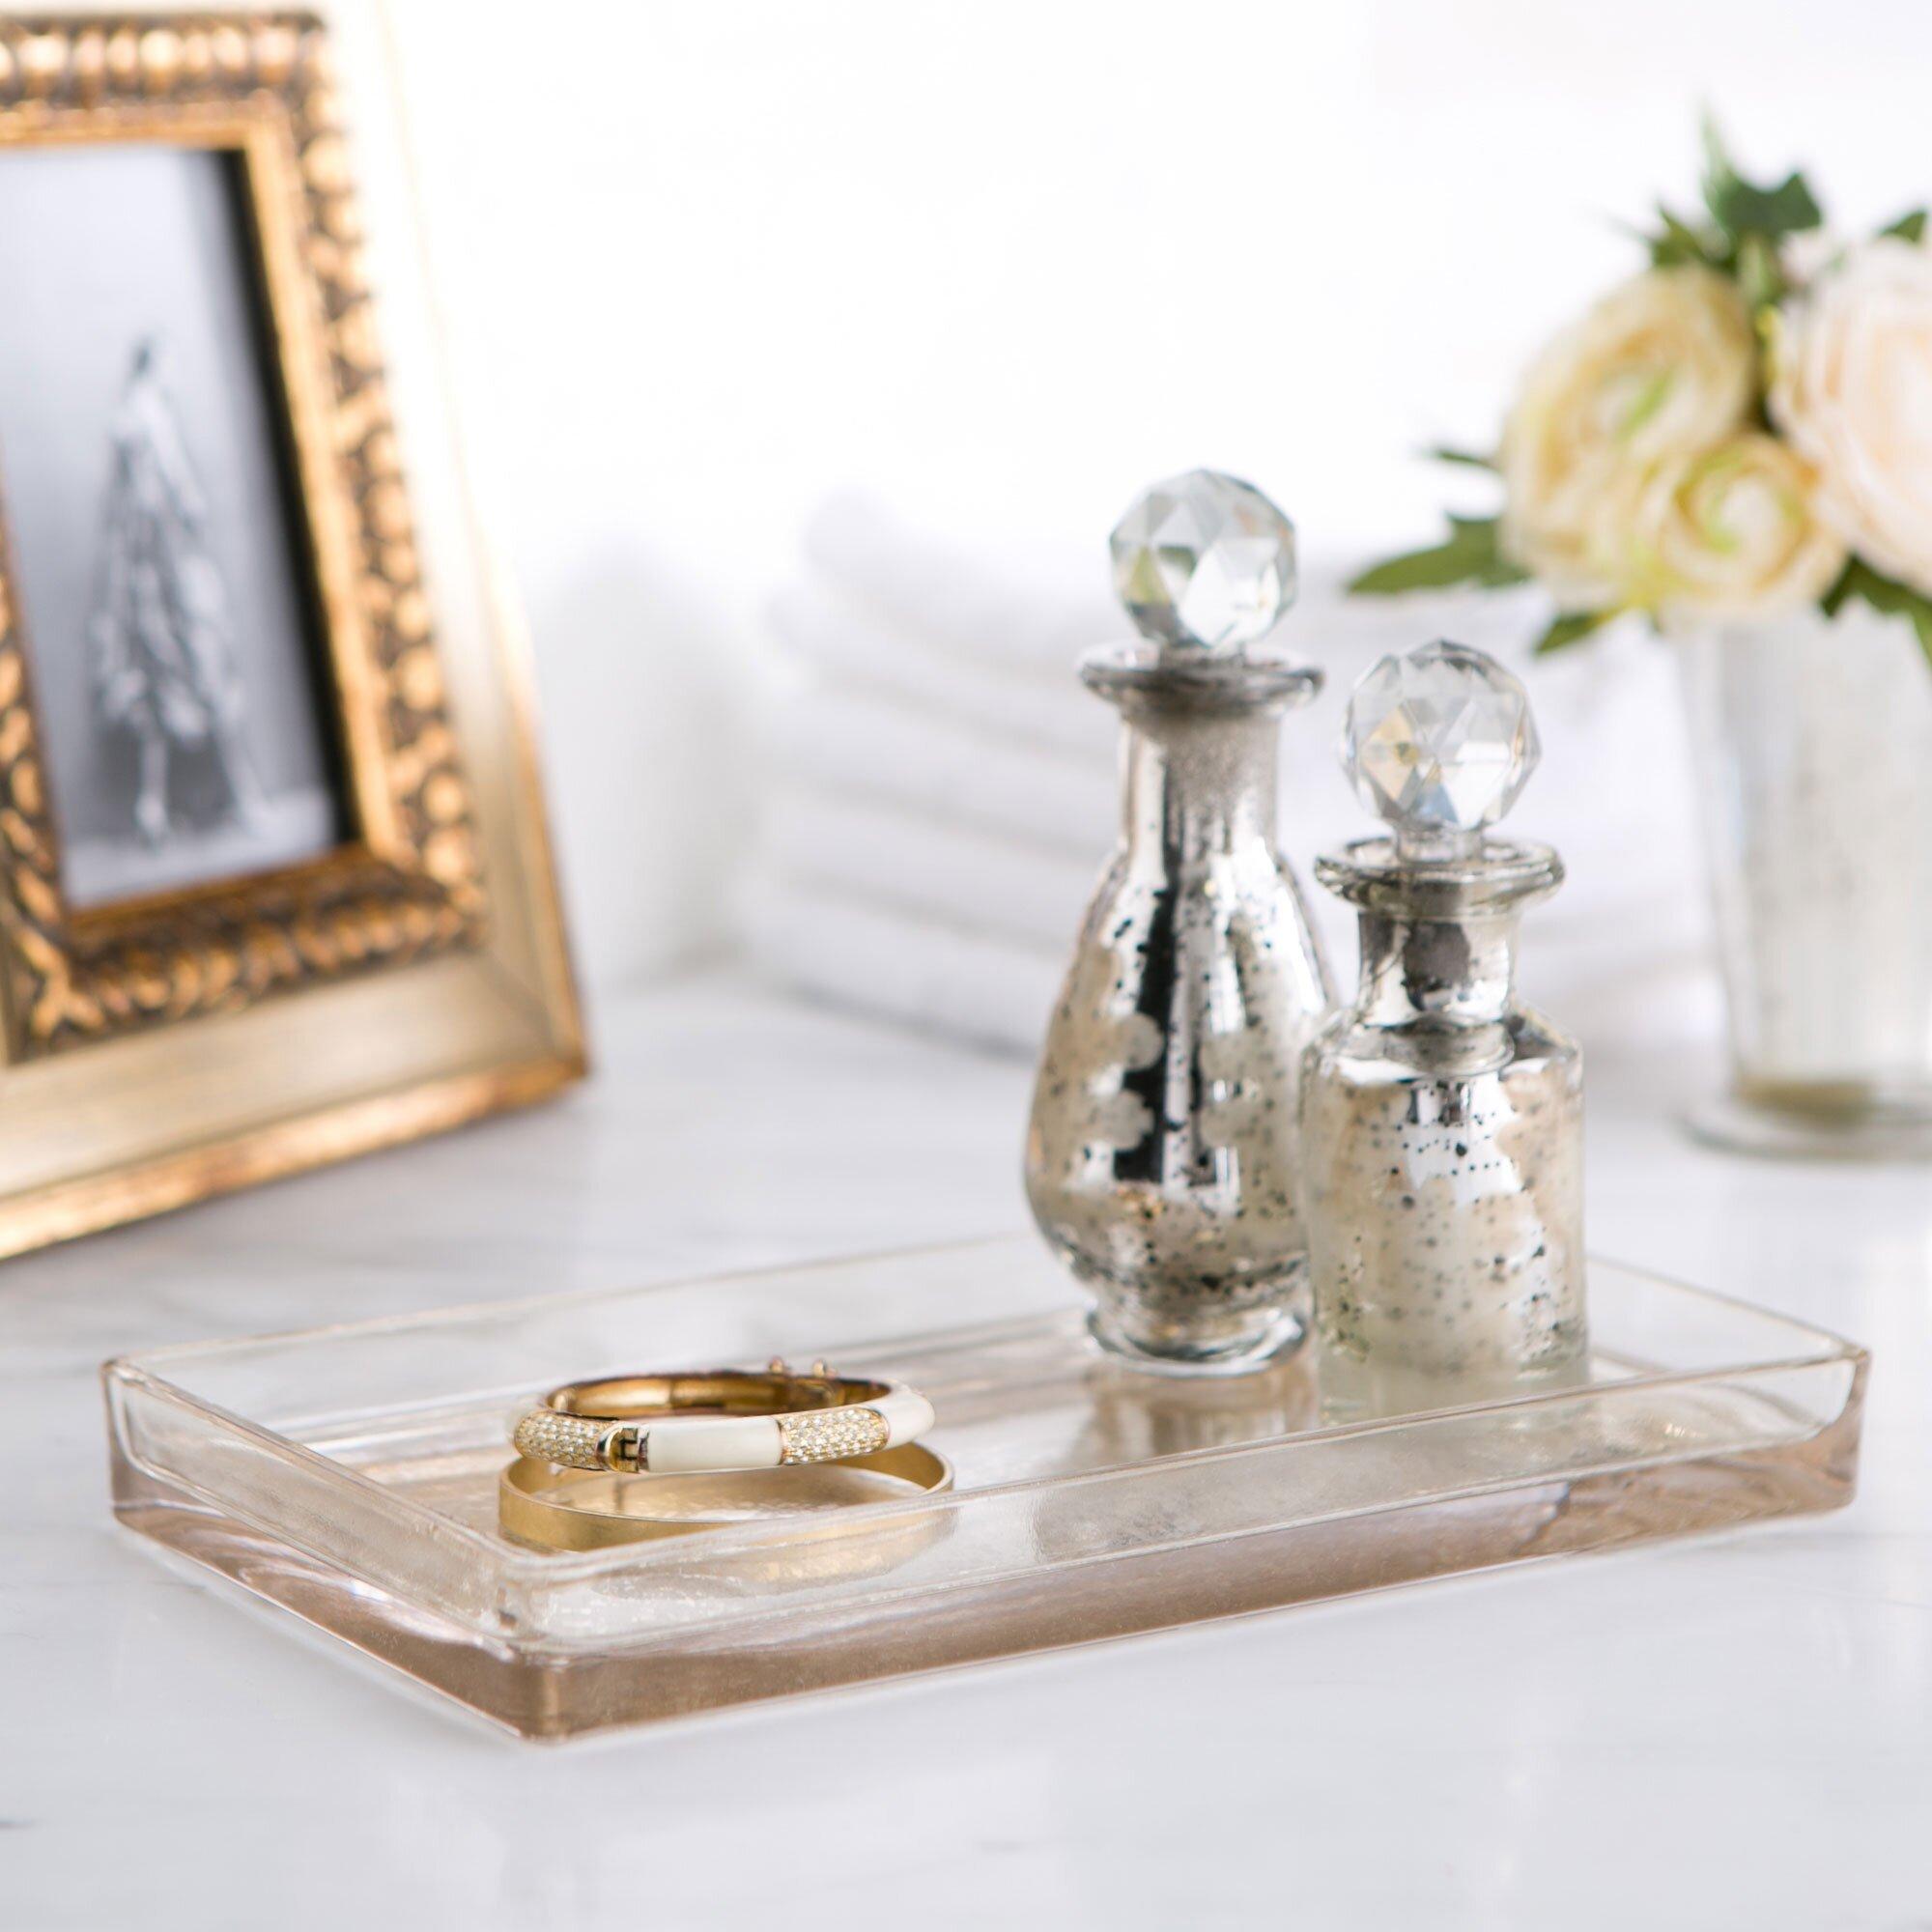 Birch Lane Mercury Glass Vanity Bathroom Accessory Tray Reviews Wayfair